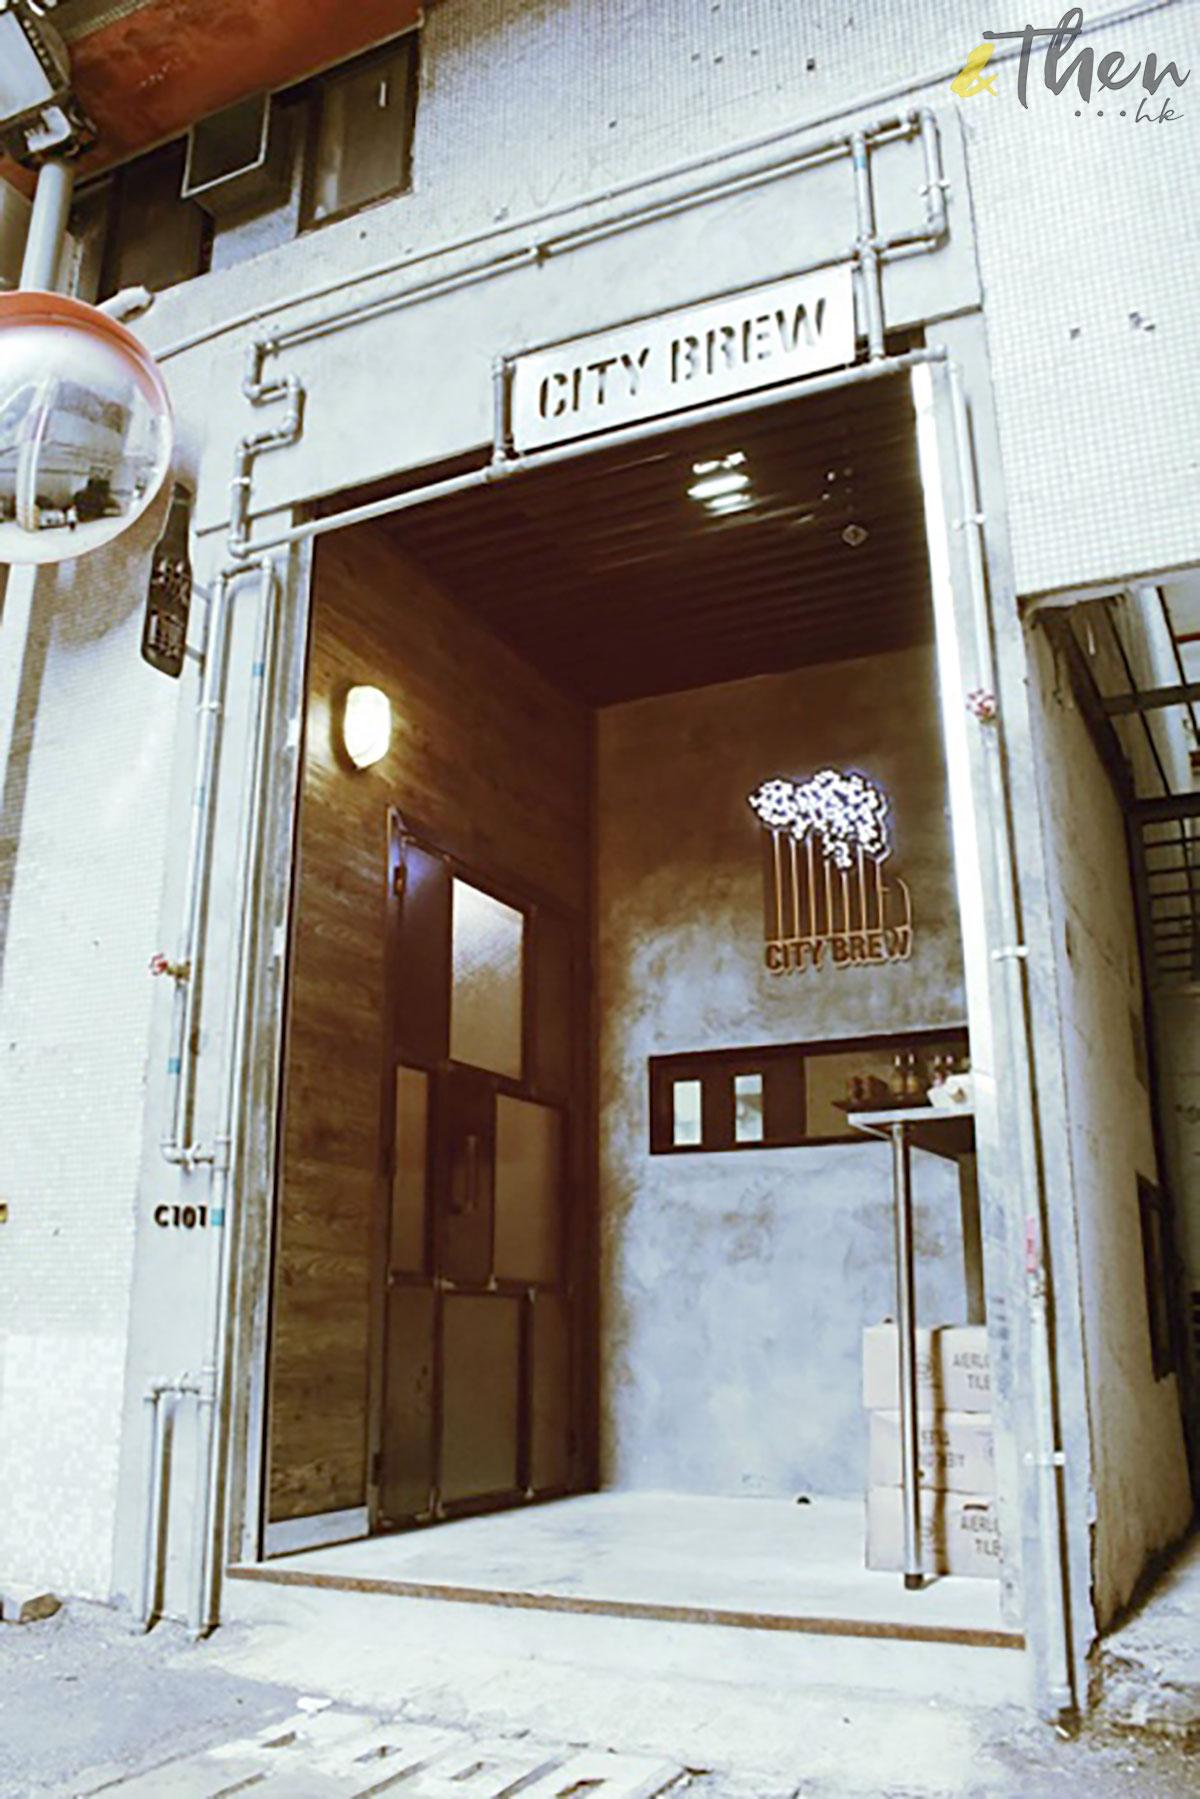 Citibrew 城釀 手工啤 啤酒廠 啤酒樽 香港品牌 香港人 舊廠房 門口